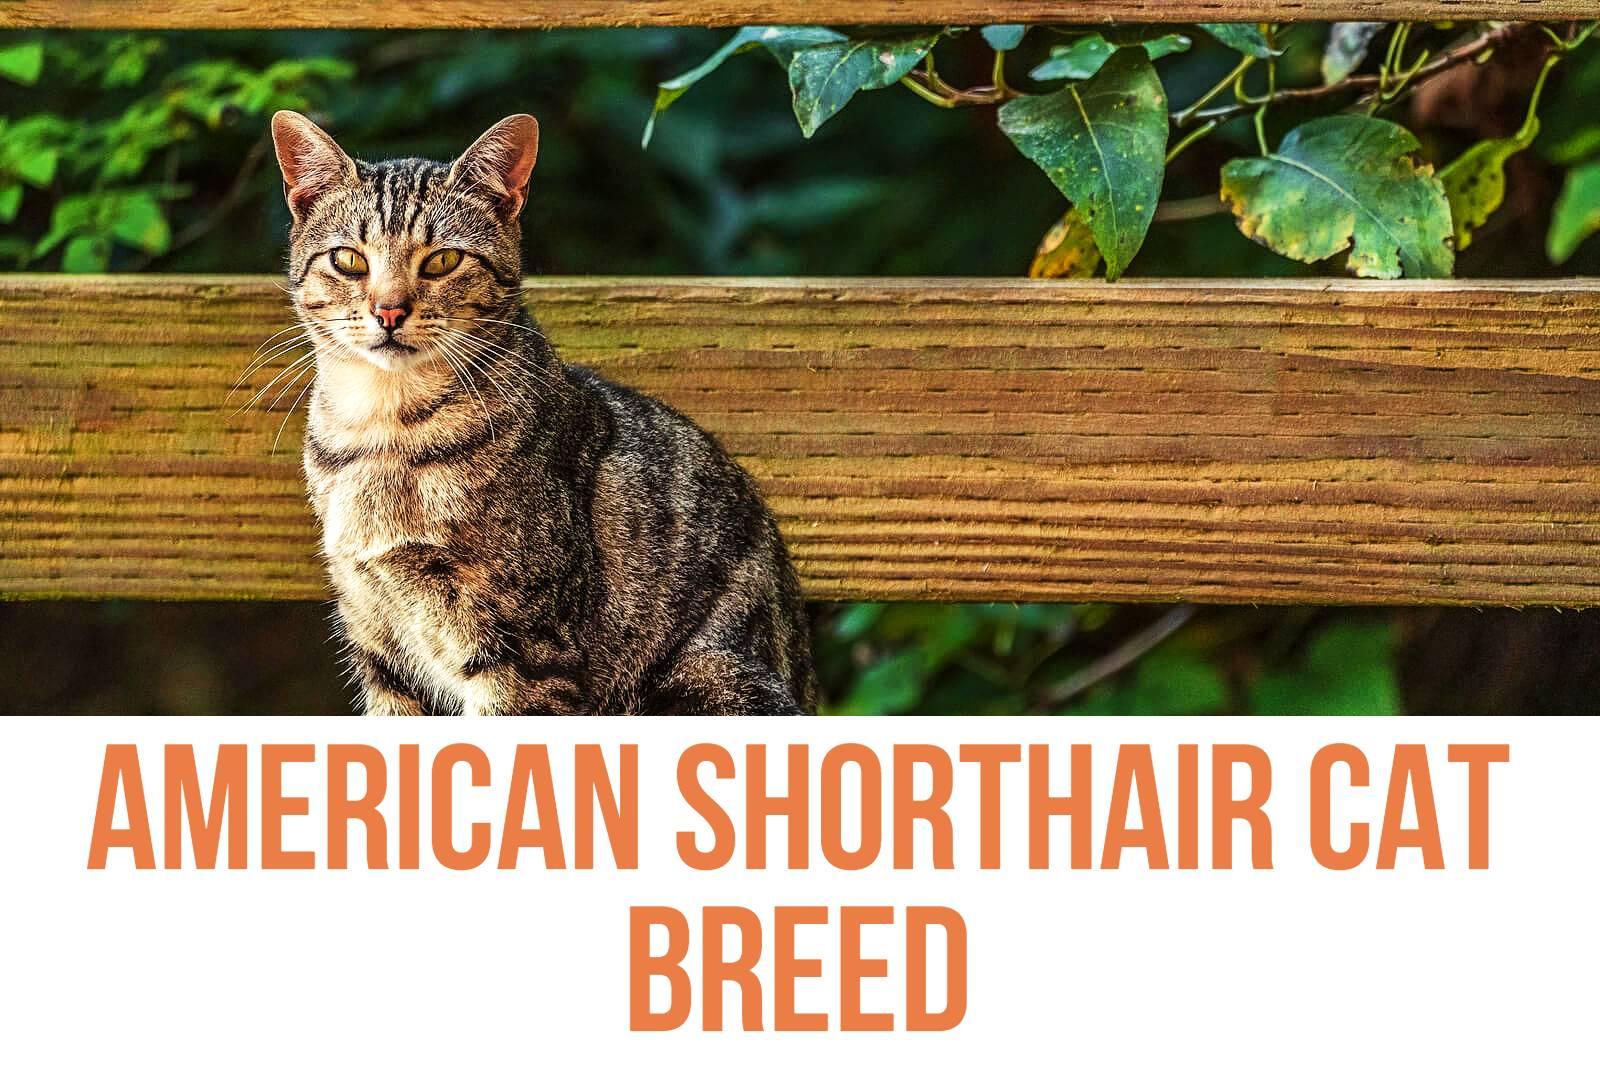 American Shorthair Cat Breed